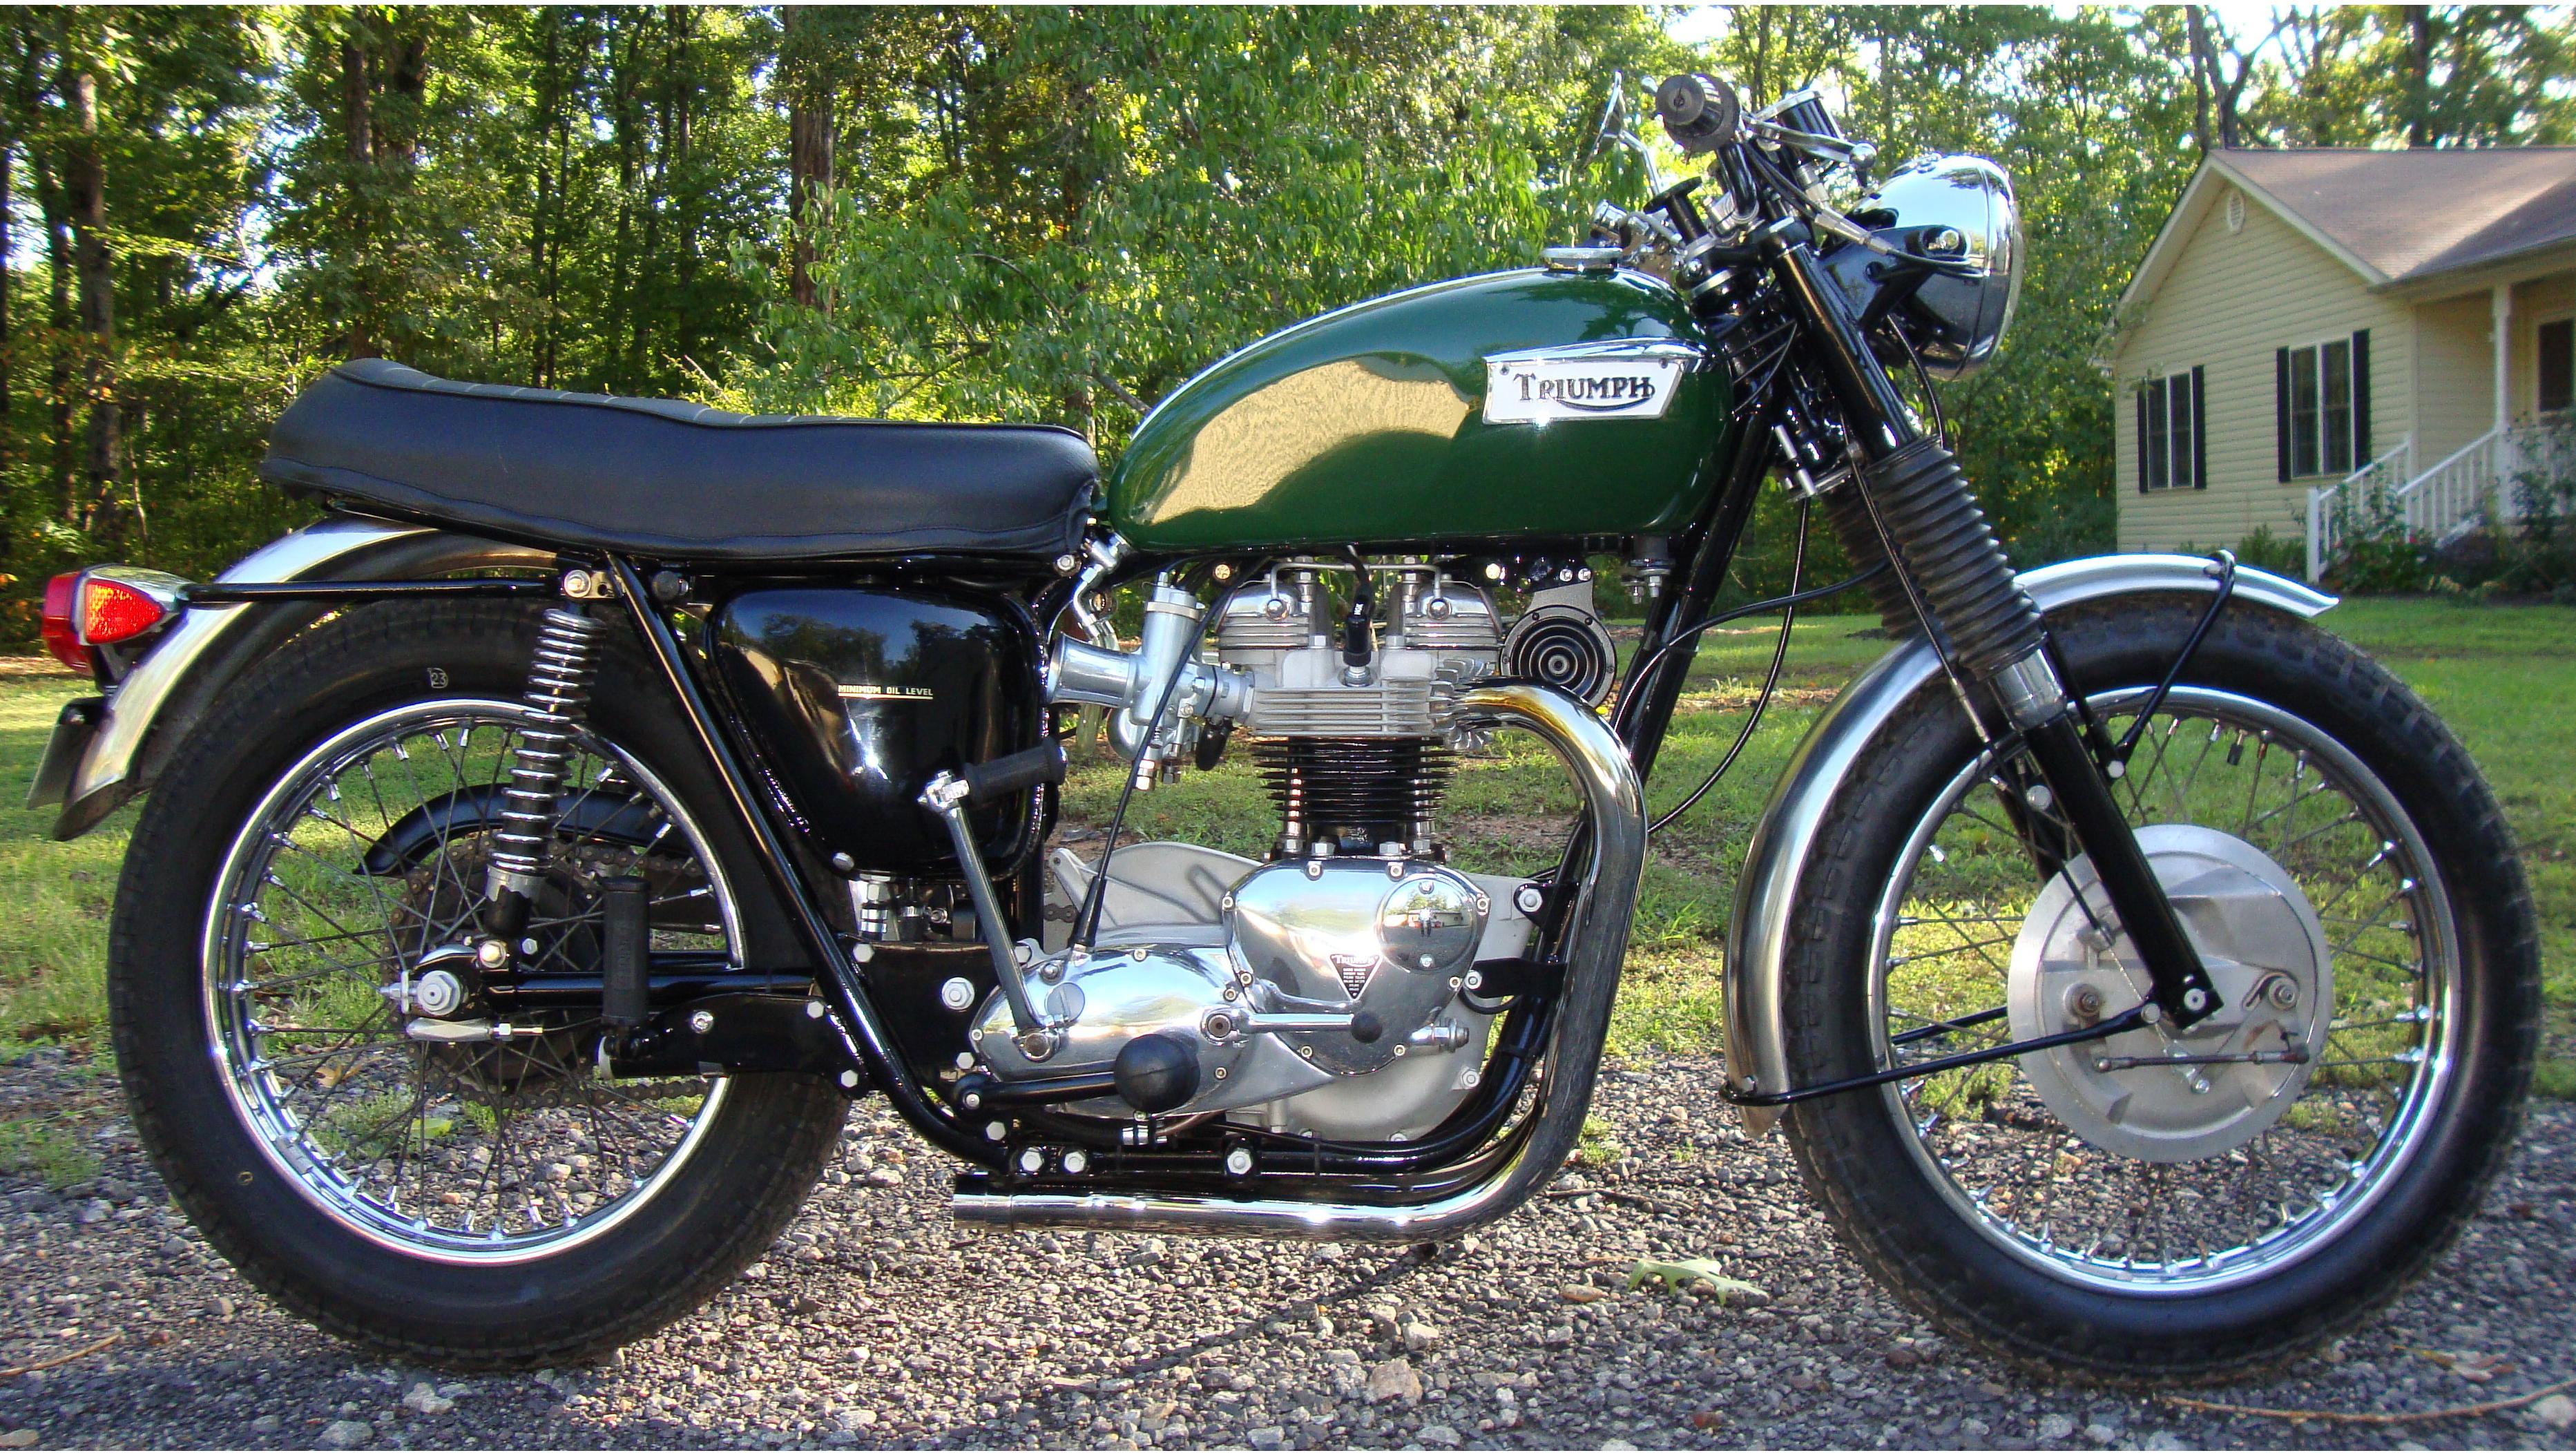 1971 triumph bonneville wiring diagram car diagrams stereo randys cycle service restoration vintage motorcycle 1967 t120r rcycle com